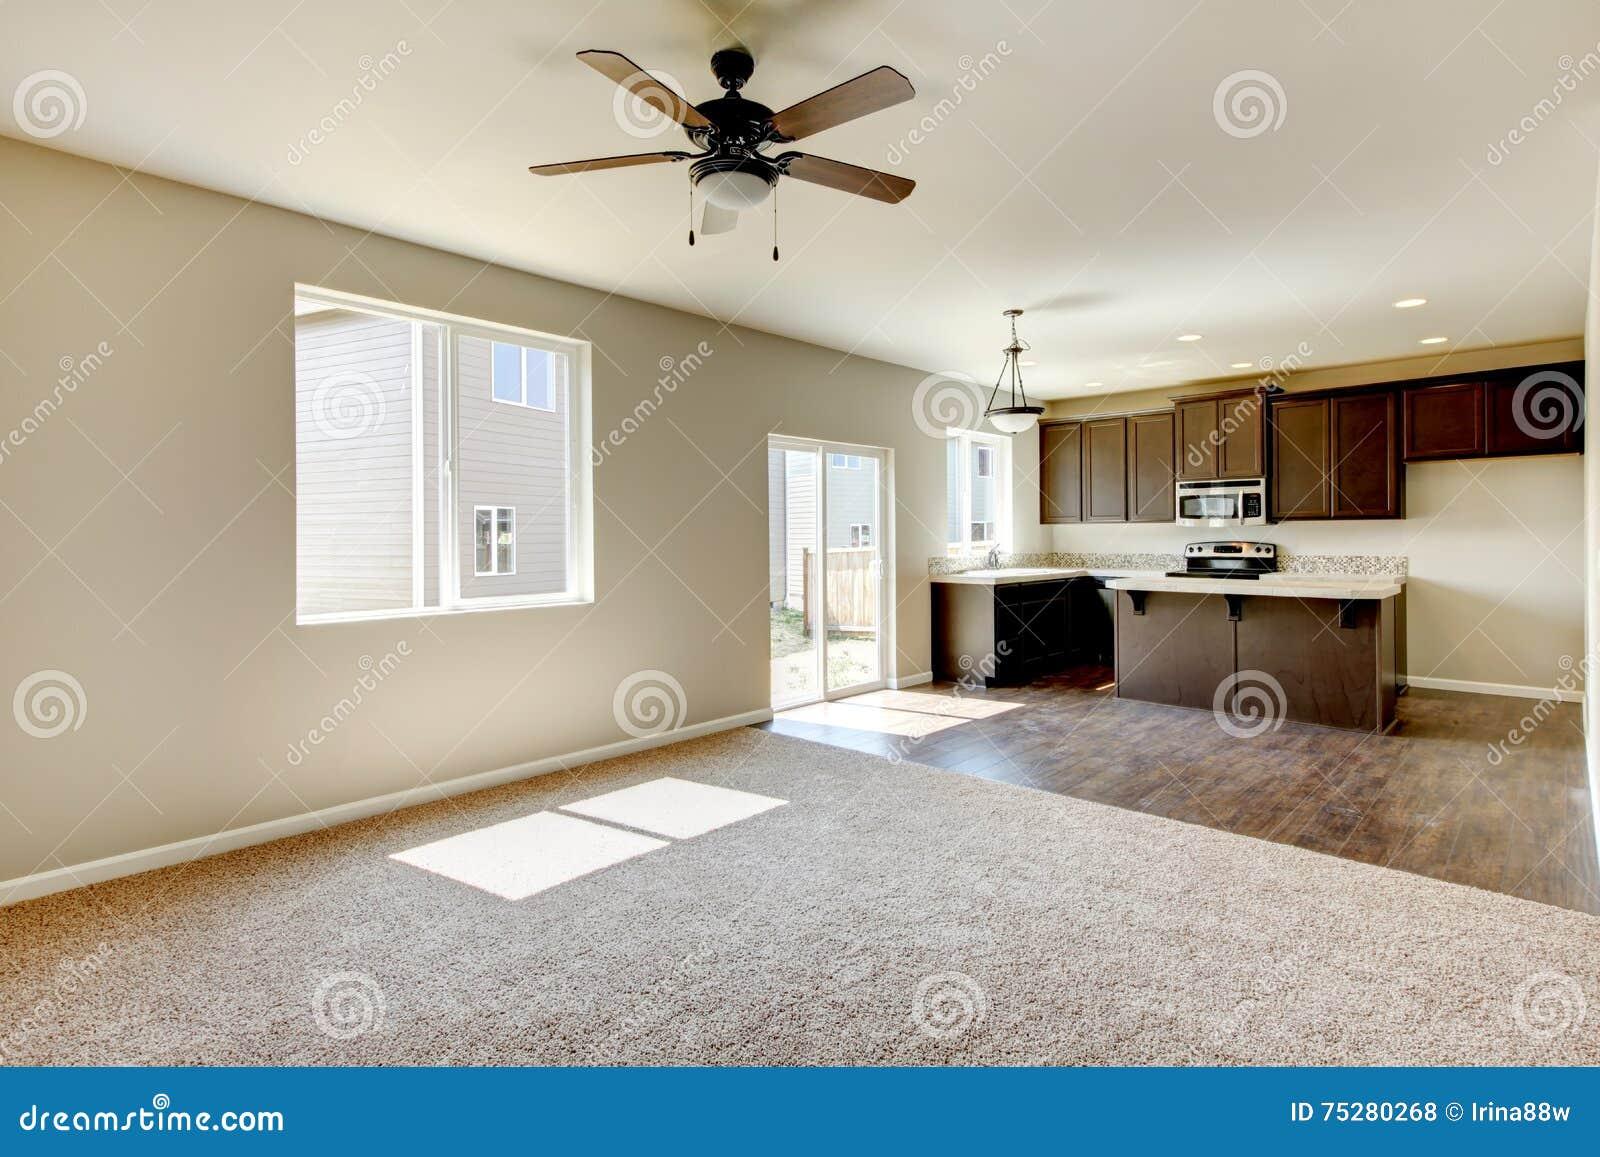 practical kitchen sinks, practical kitchen cabinets, laundry room flooring, practical kitchen design, practical kitchen counters, bathroom flooring, garden flooring, on practical kitchen flooring